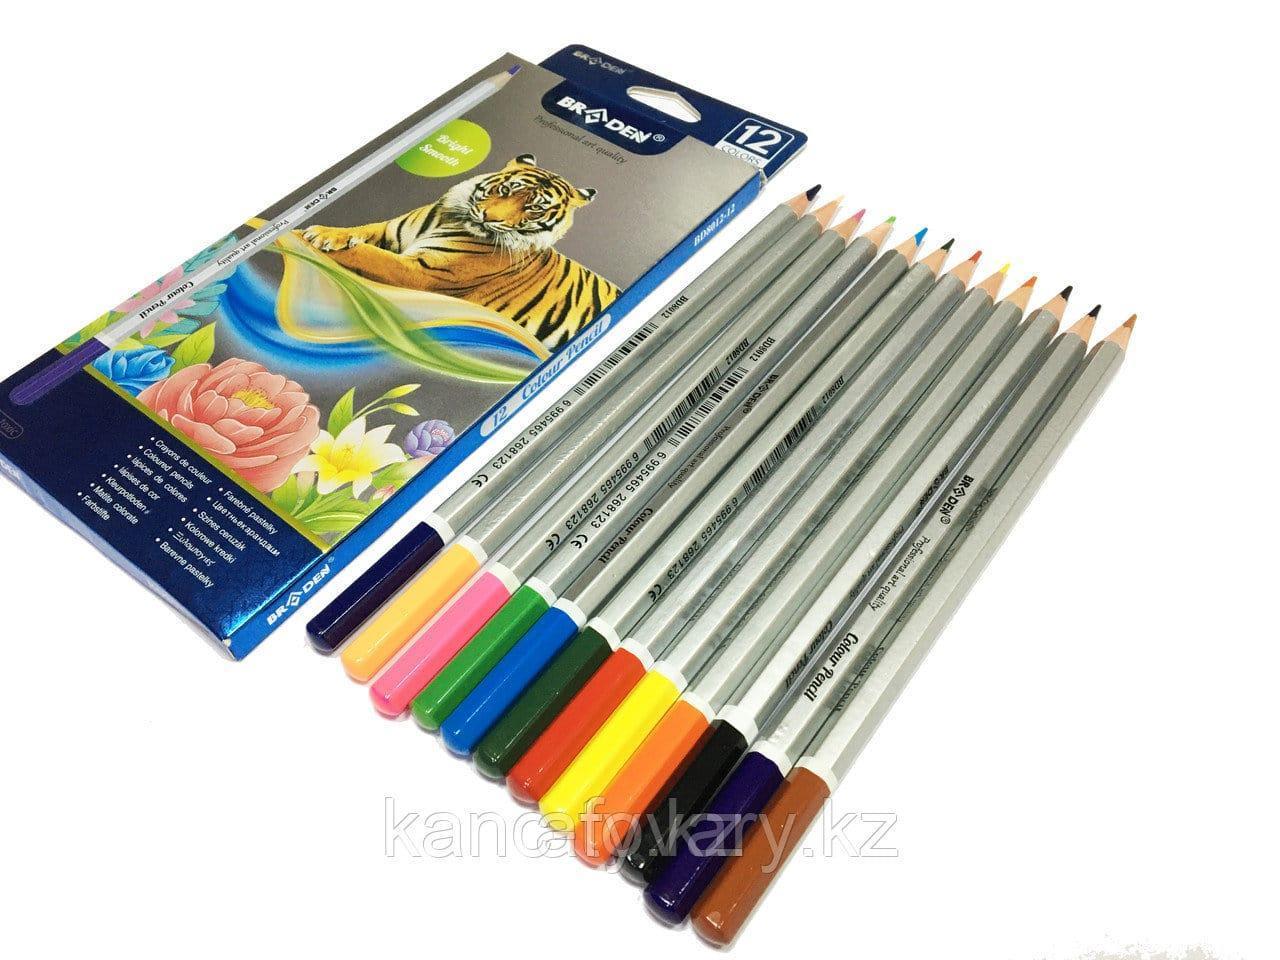 Цветные карандаши MB 003 (V 06.09)